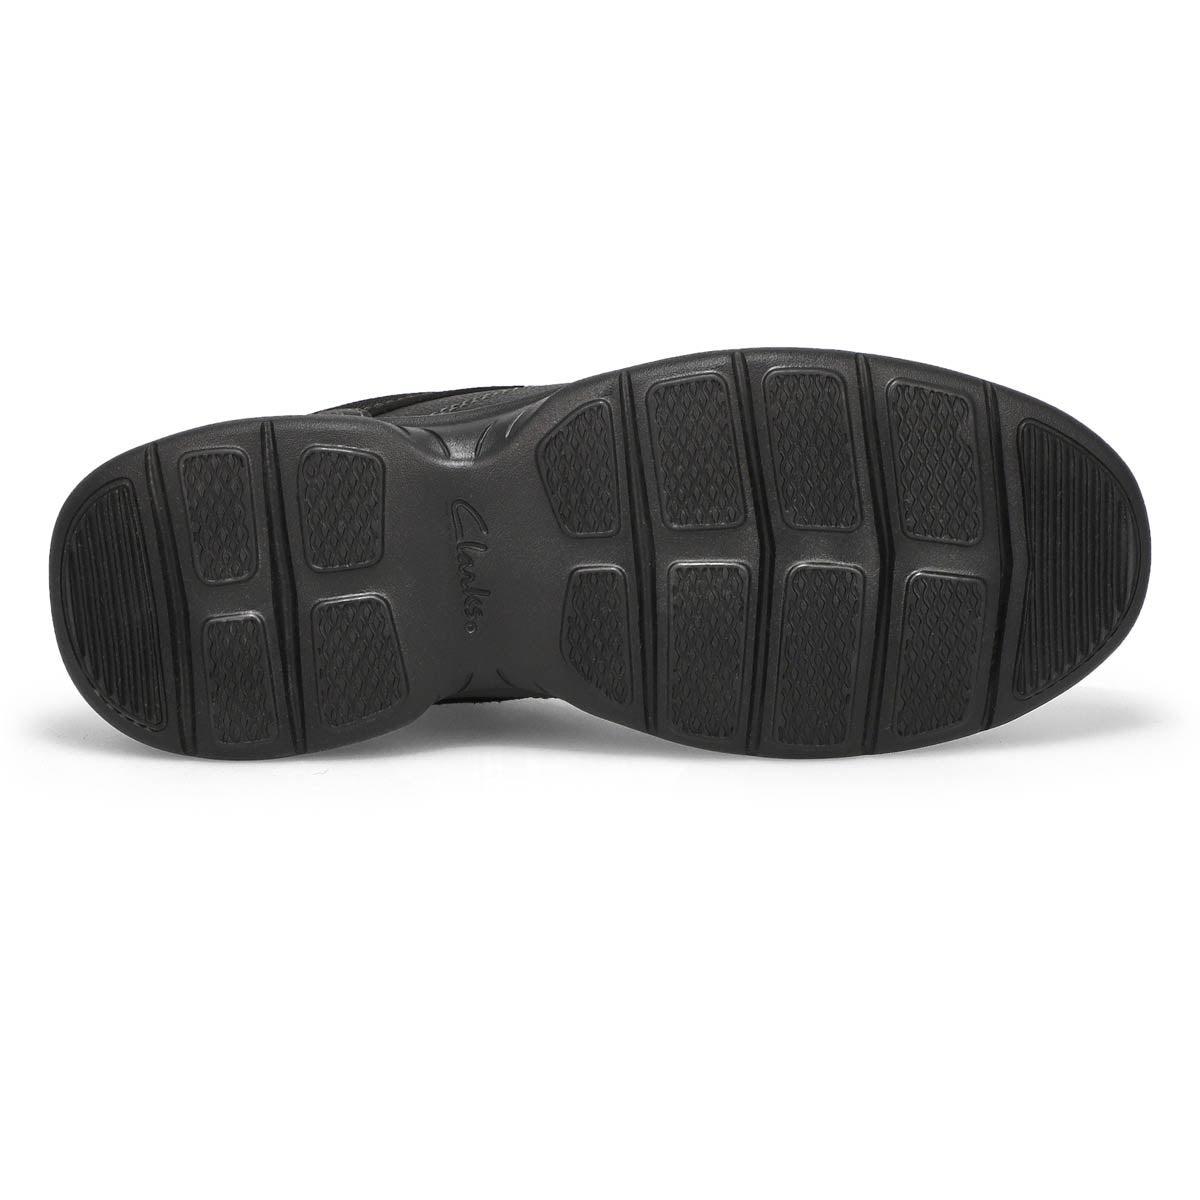 Mns Bradley Walk black lace up loafer